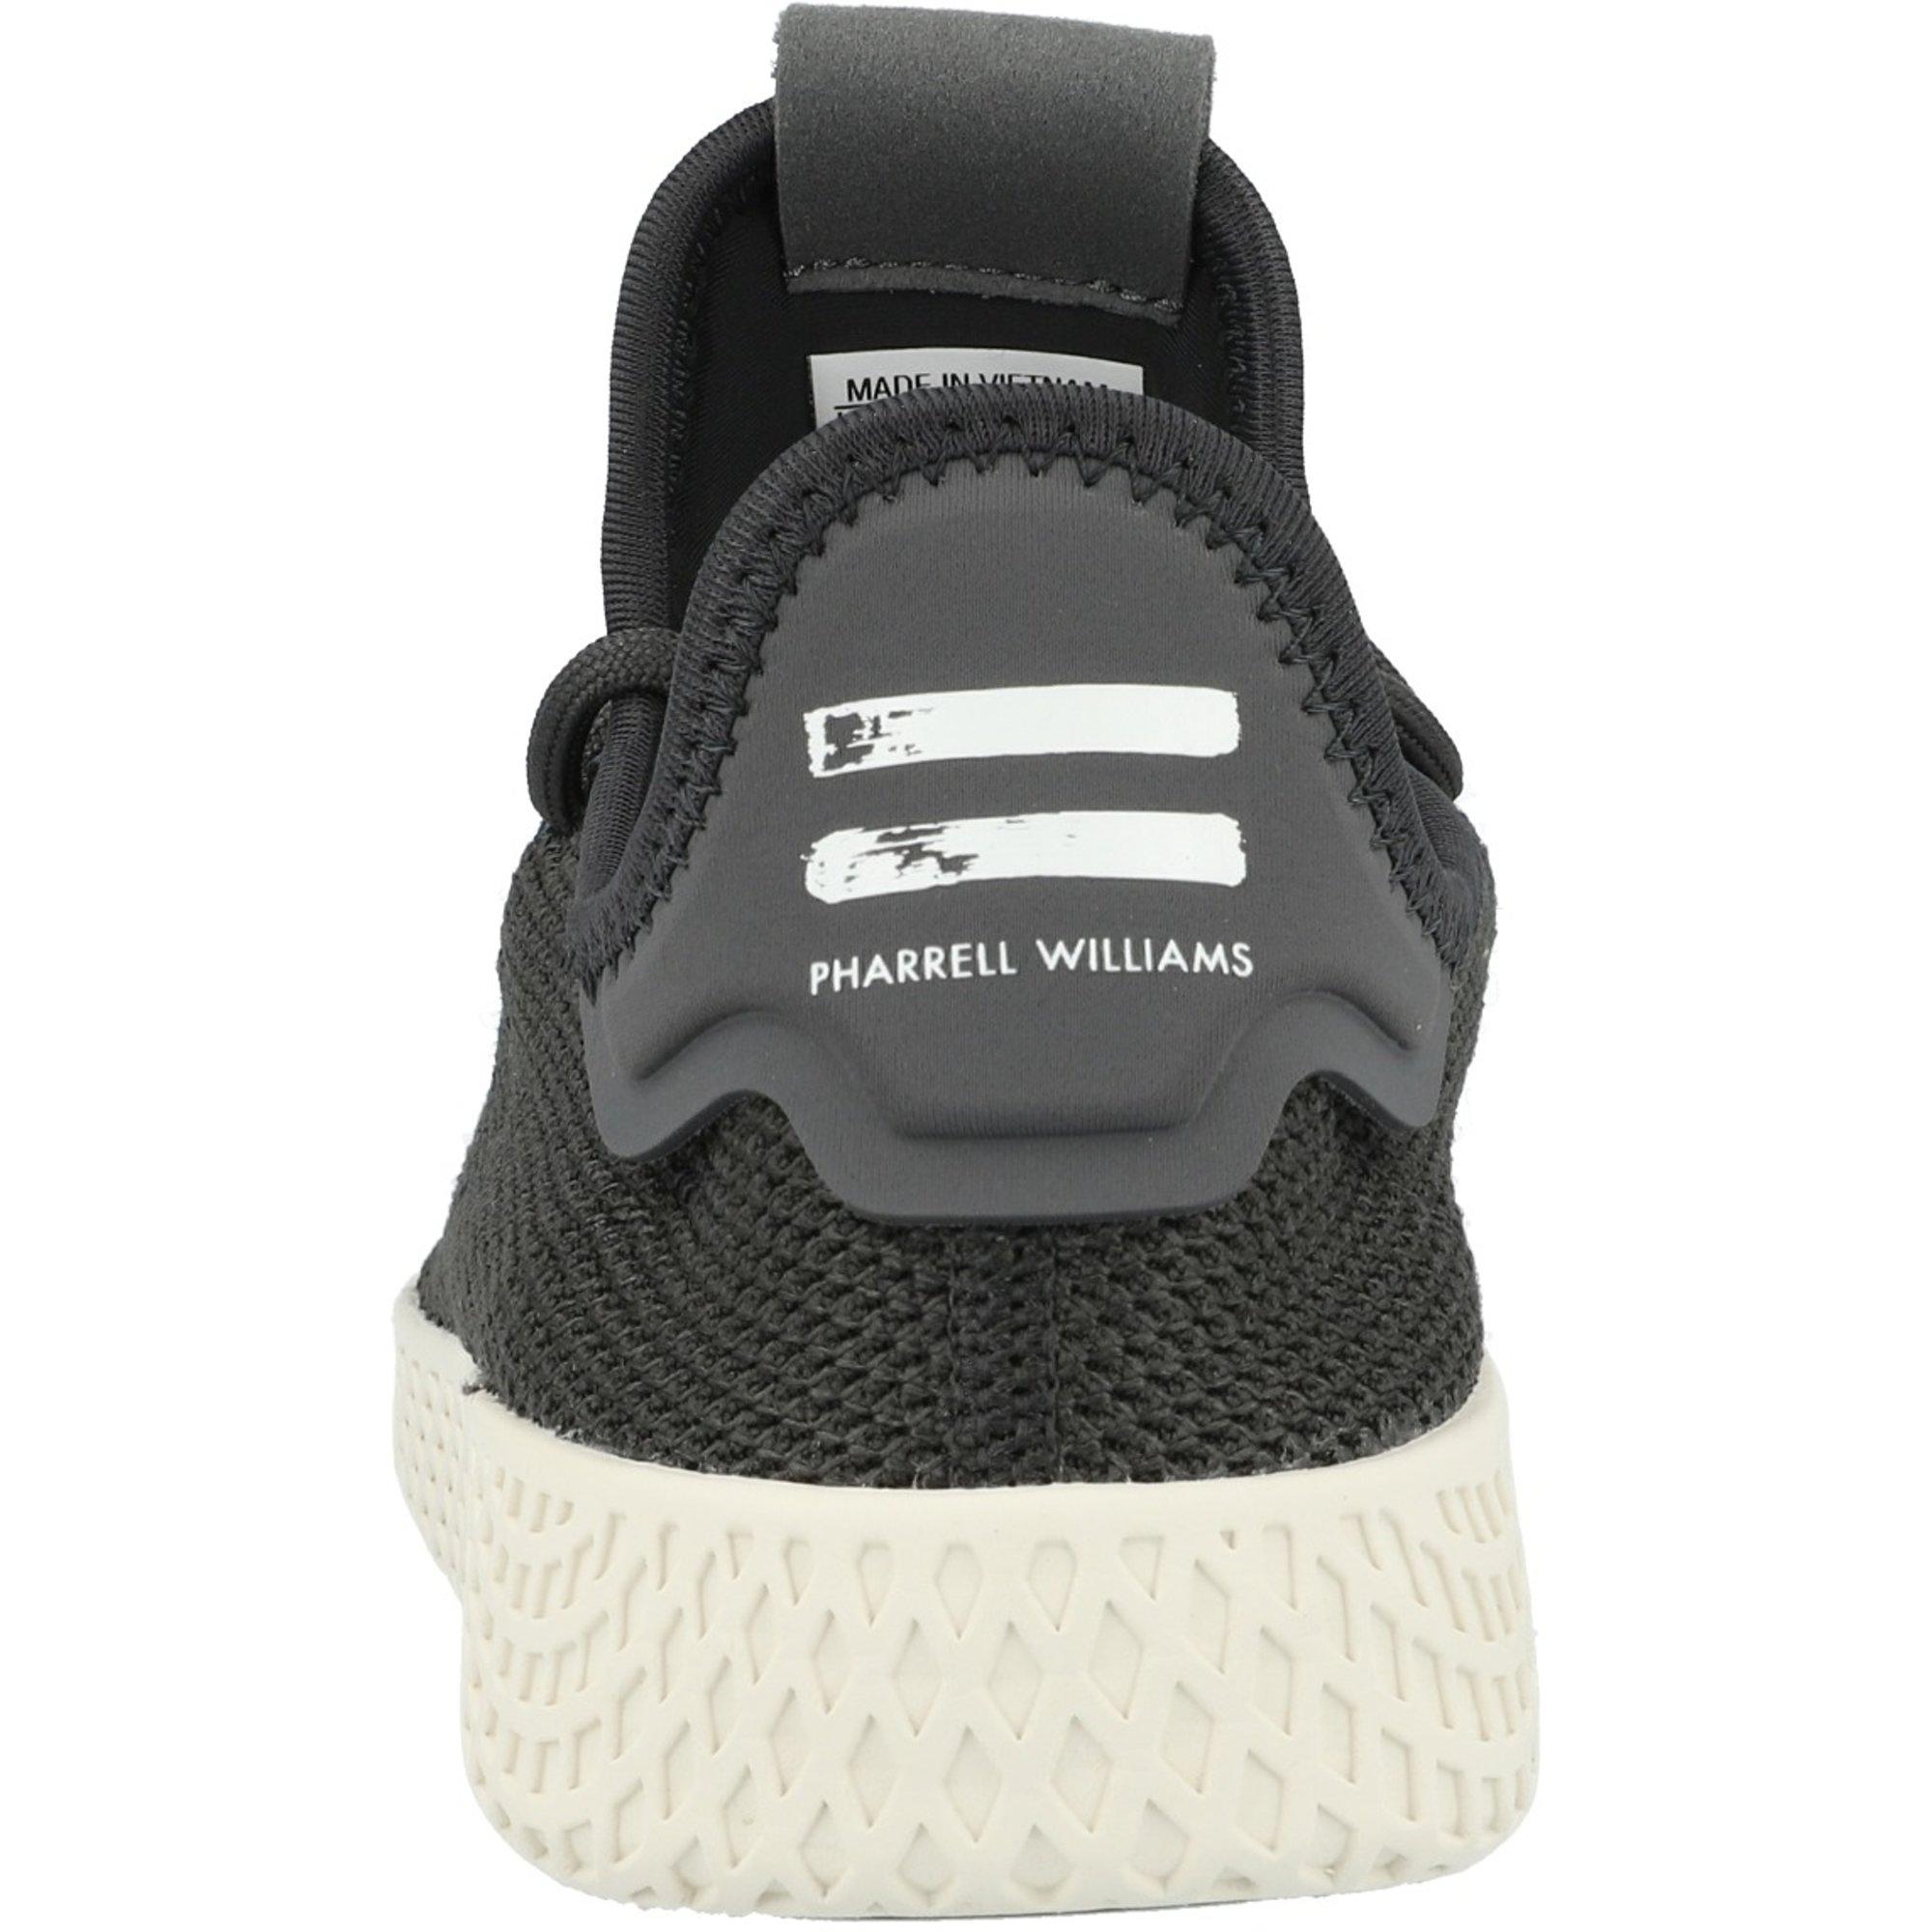 código postal en progreso Sollozos  adidas Originals Pharrell Williams Tennis Hu J Carbon Textile - Trainers  Shoes - Awesome Shoes